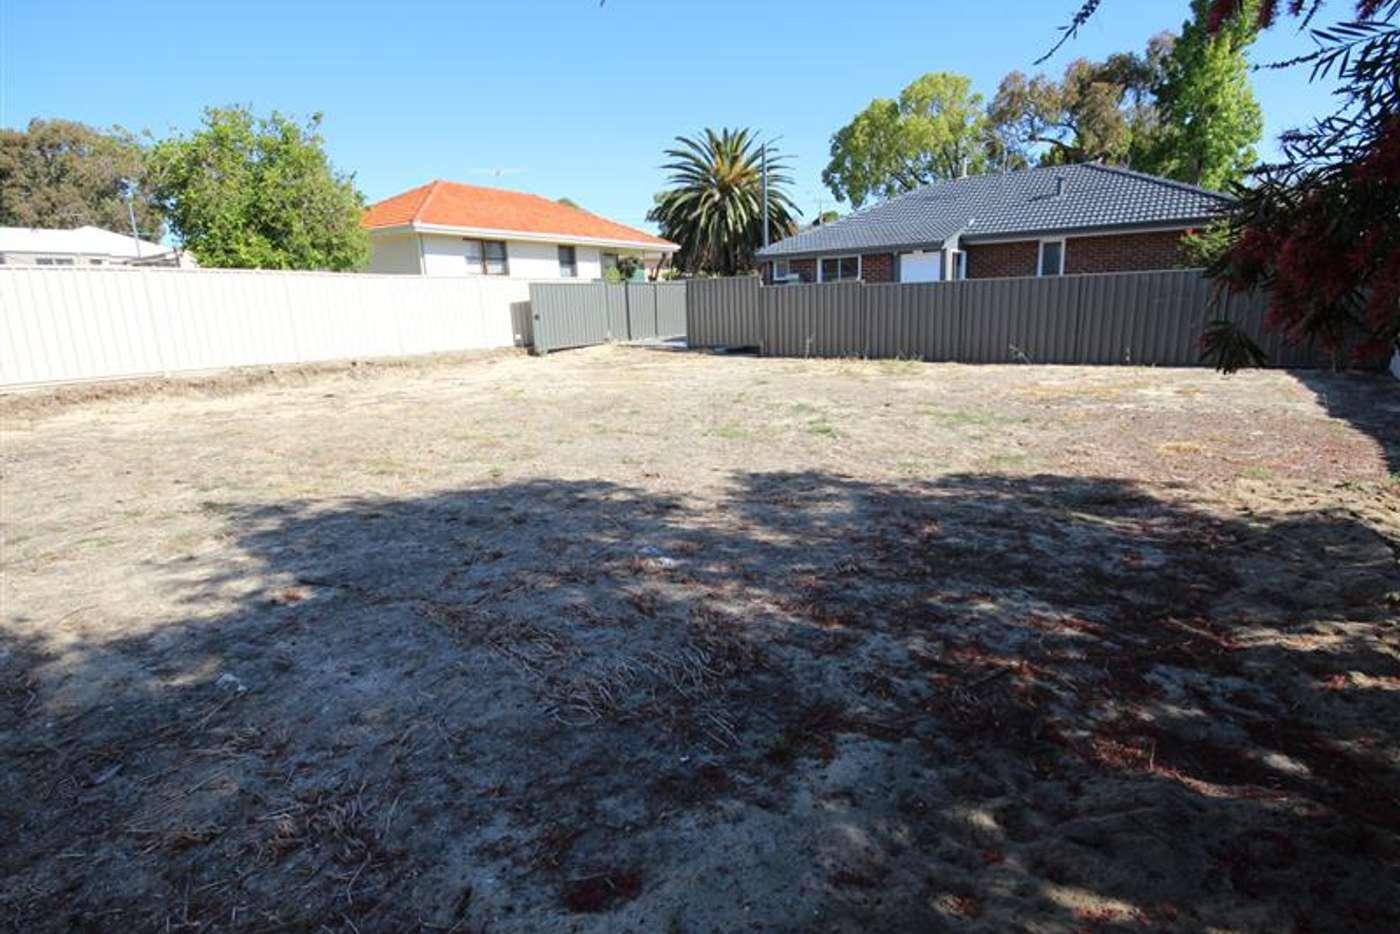 Main view of Homely residentialLand listing, 21B Tangmere Way, Balga WA 6061